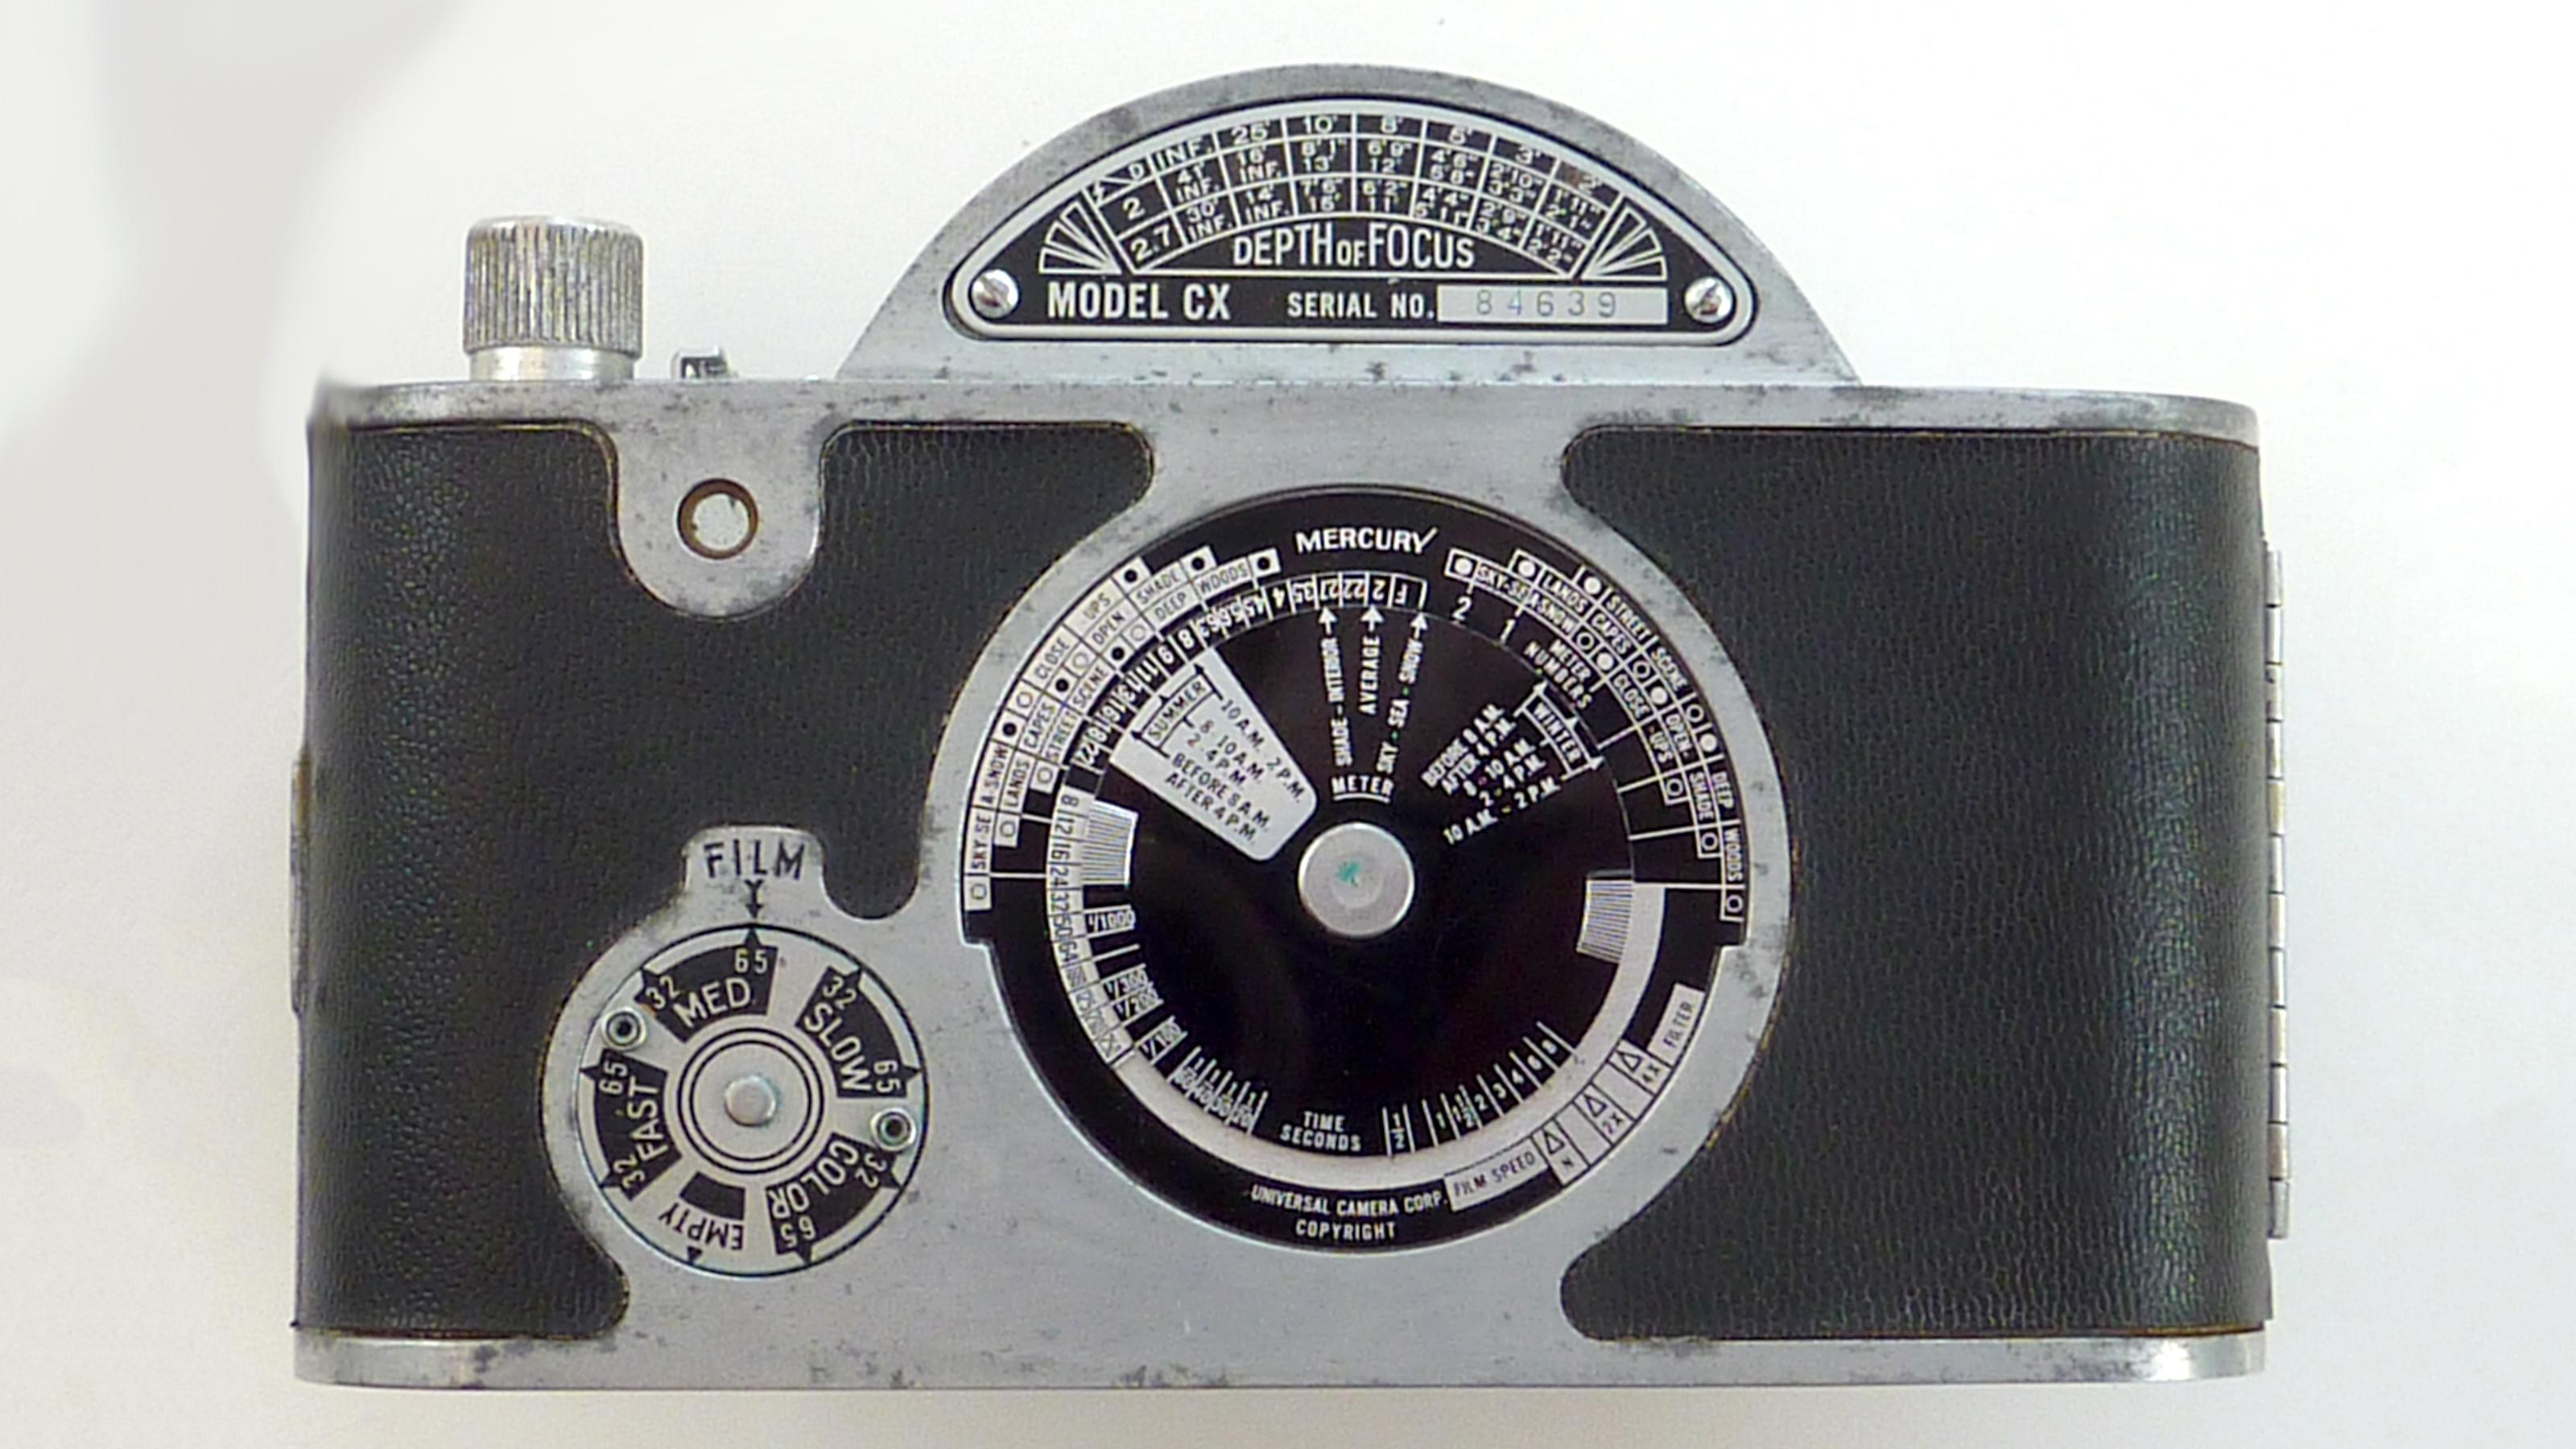 The back of the Mercury II camera